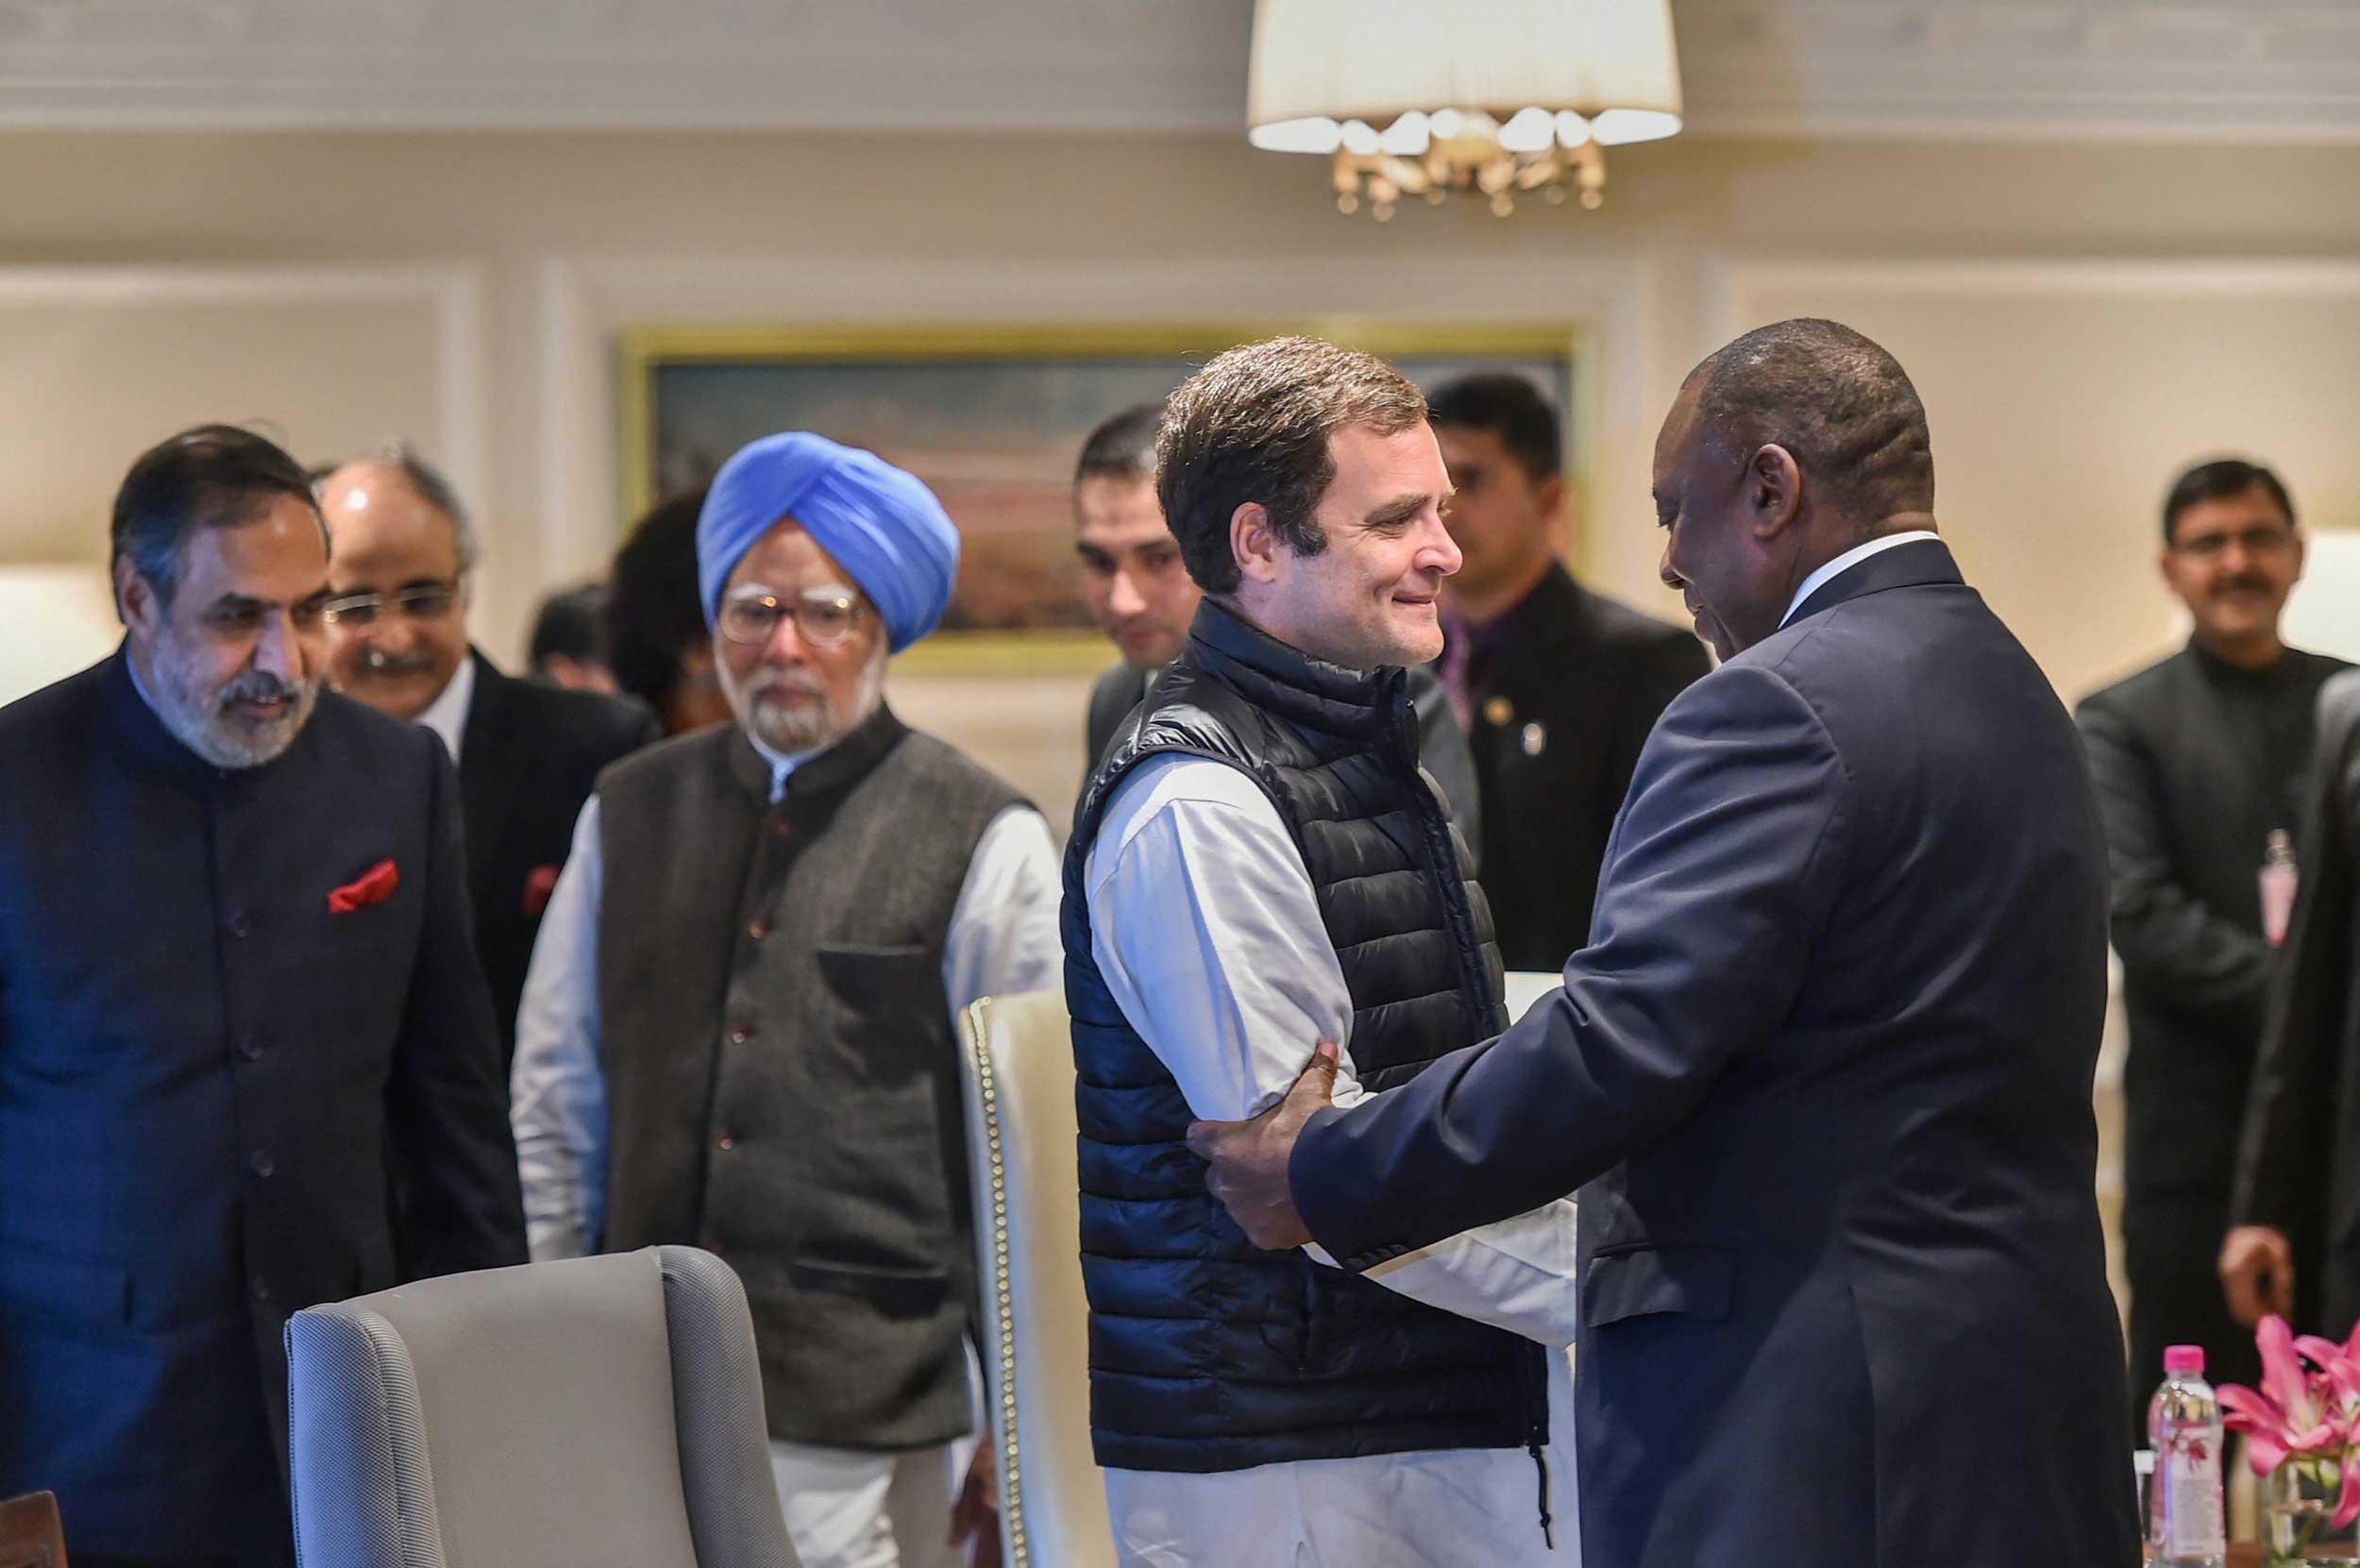 Congress plugs its idea of India: no majoritarian ideology, please